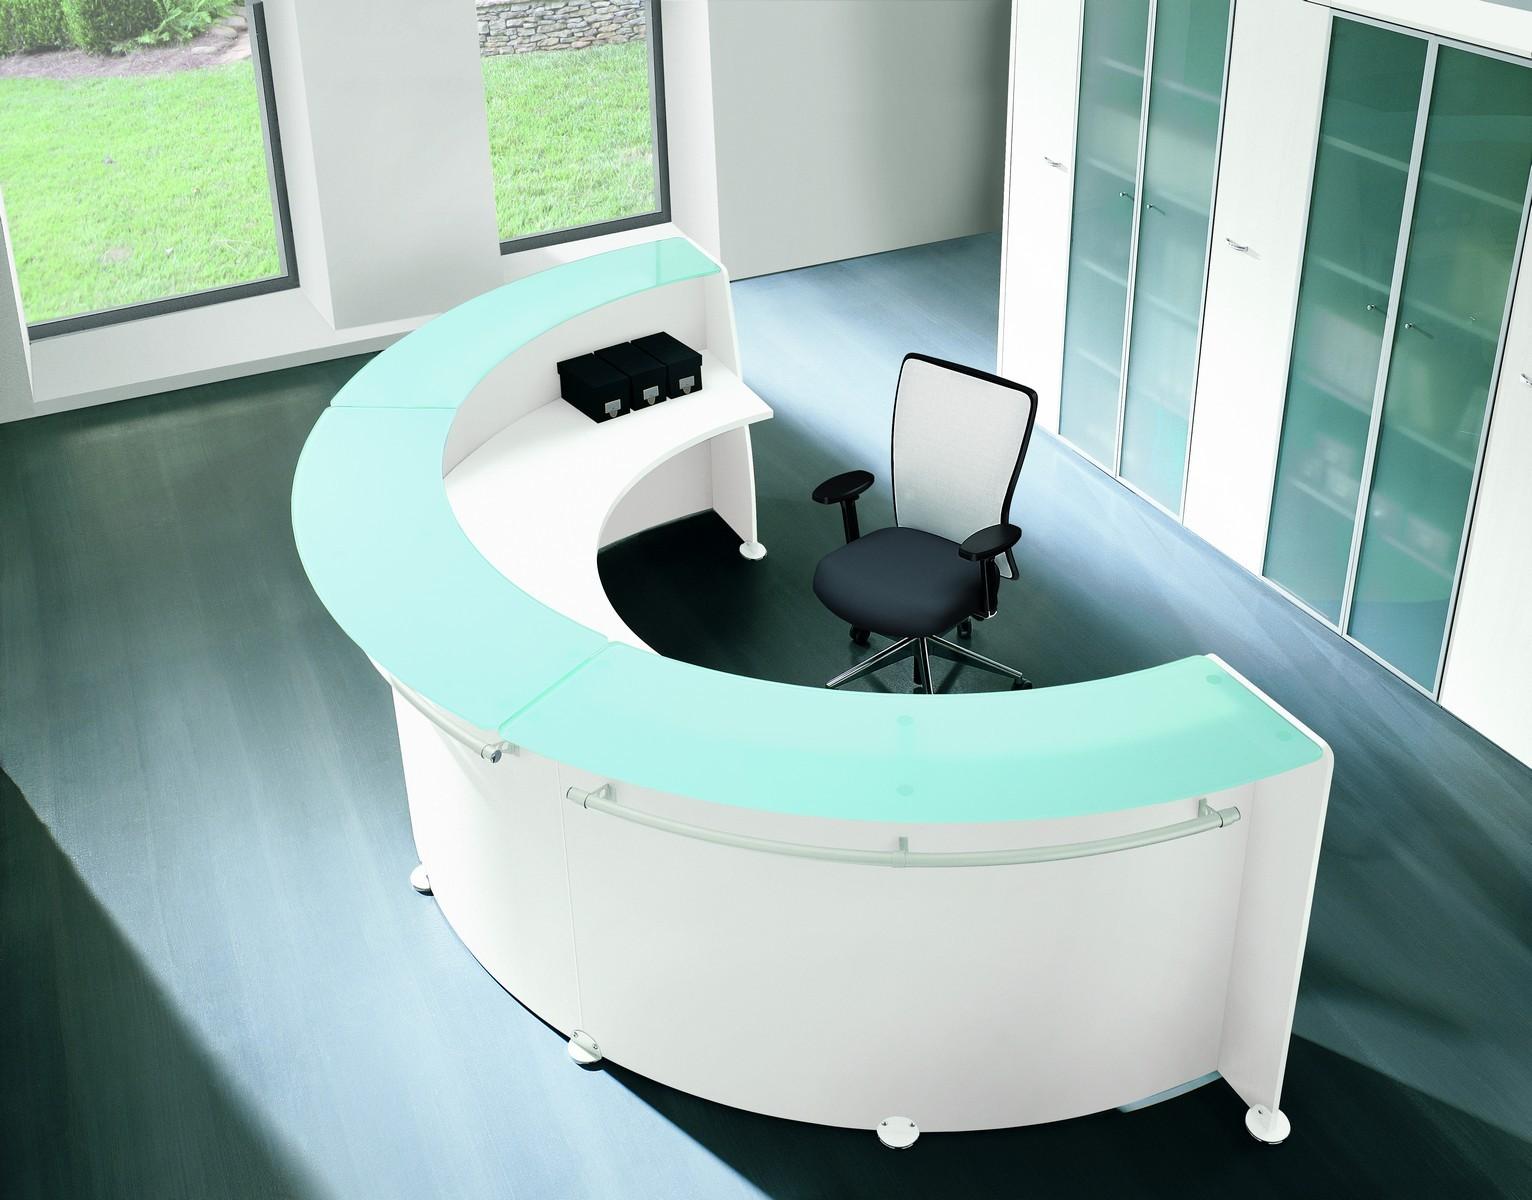 banque d 39 accueil top verre achat mobilier accueil. Black Bedroom Furniture Sets. Home Design Ideas